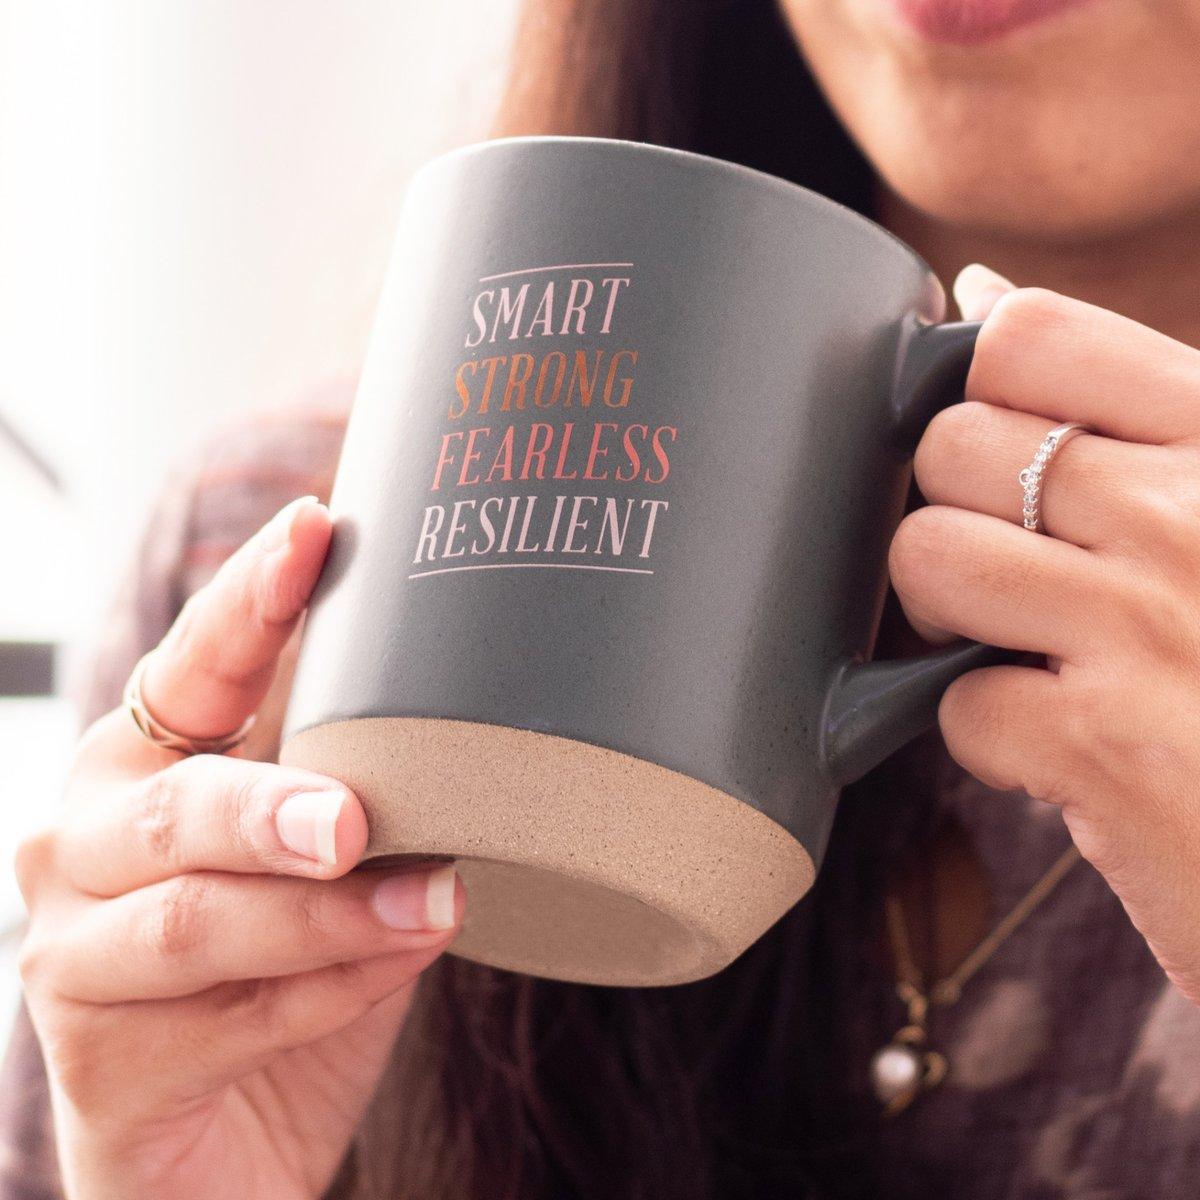 Have a daily reminder for yourself of what you hold within. #GiftShed #GiftShedQA #InspireCreateShare #DohaFestivalCity #Doha #Qatar #coffee #mugs #gifts #WomensDay #thehappynow #femaleempowerment #qatarlife #qatari #qatargirls #qatarshopping #qatar_shoppingpic.twitter.com/Q43fEdWq2M